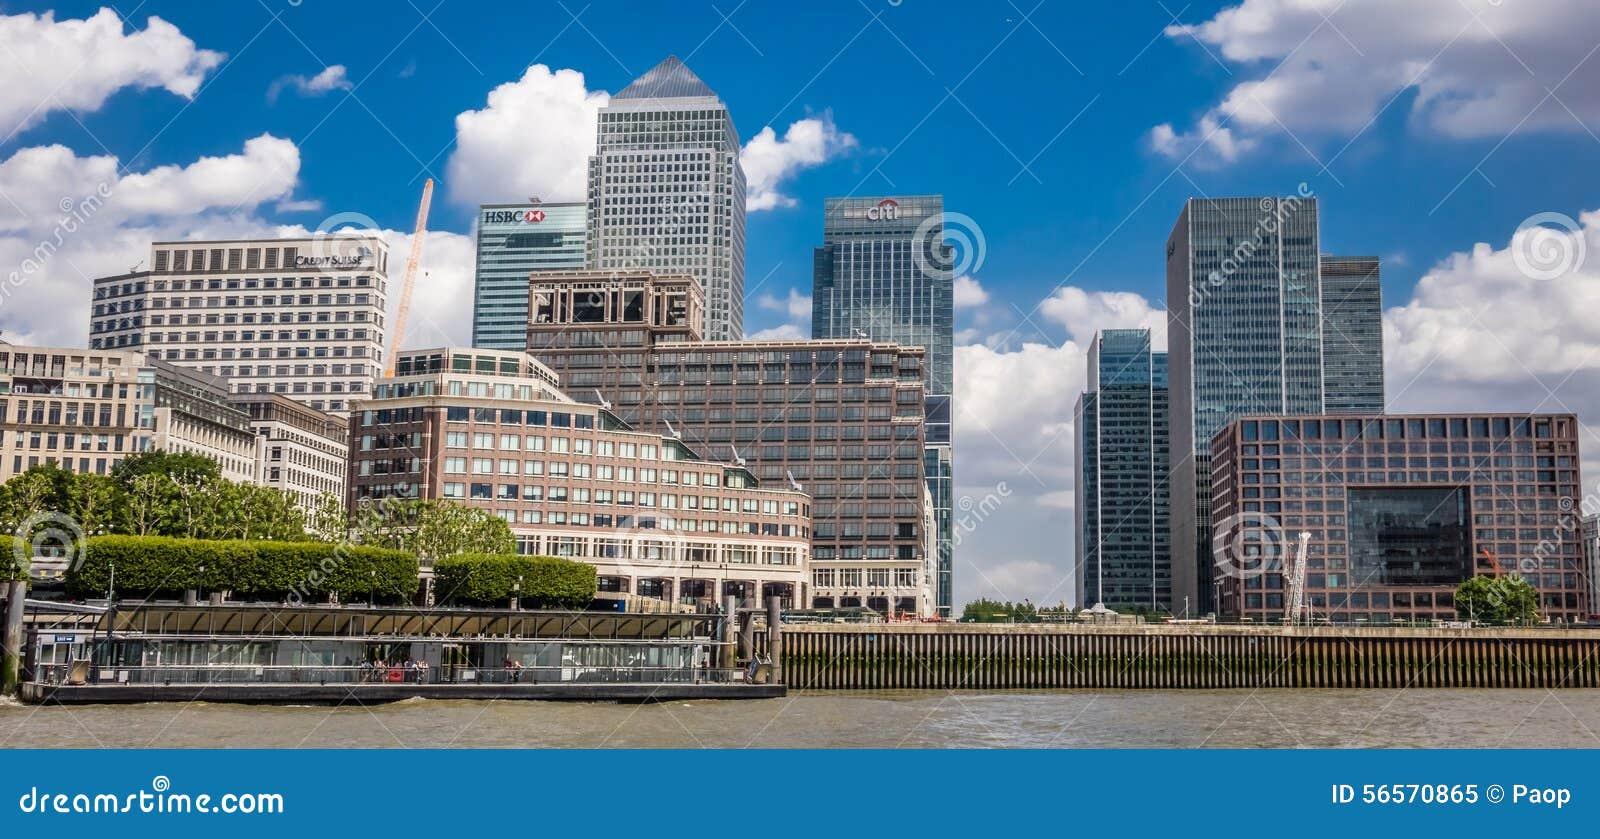 Download Ορίζοντας Canary Wharf εκδοτική εικόνα. εικόνα από συγκεκριμένος - 56570865